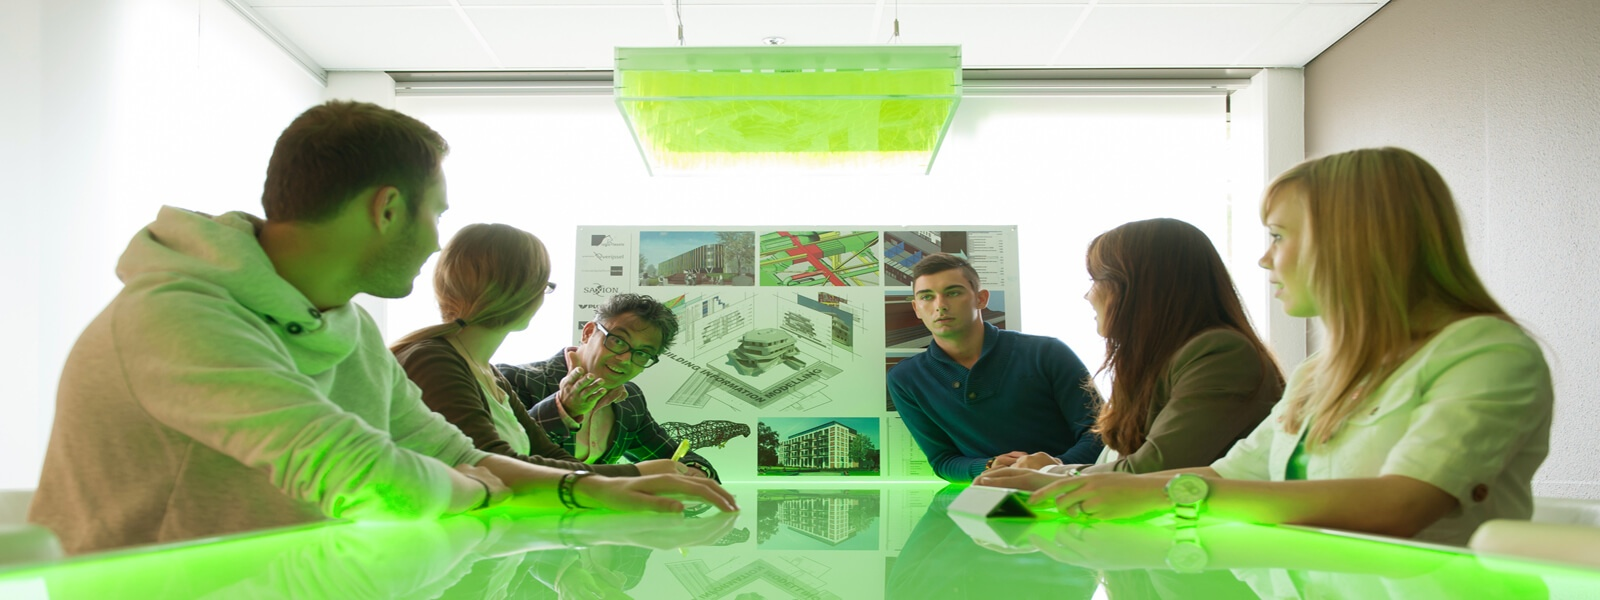 management-studyinholland-universitiesofappliedsciences-saxion-deventer-holland